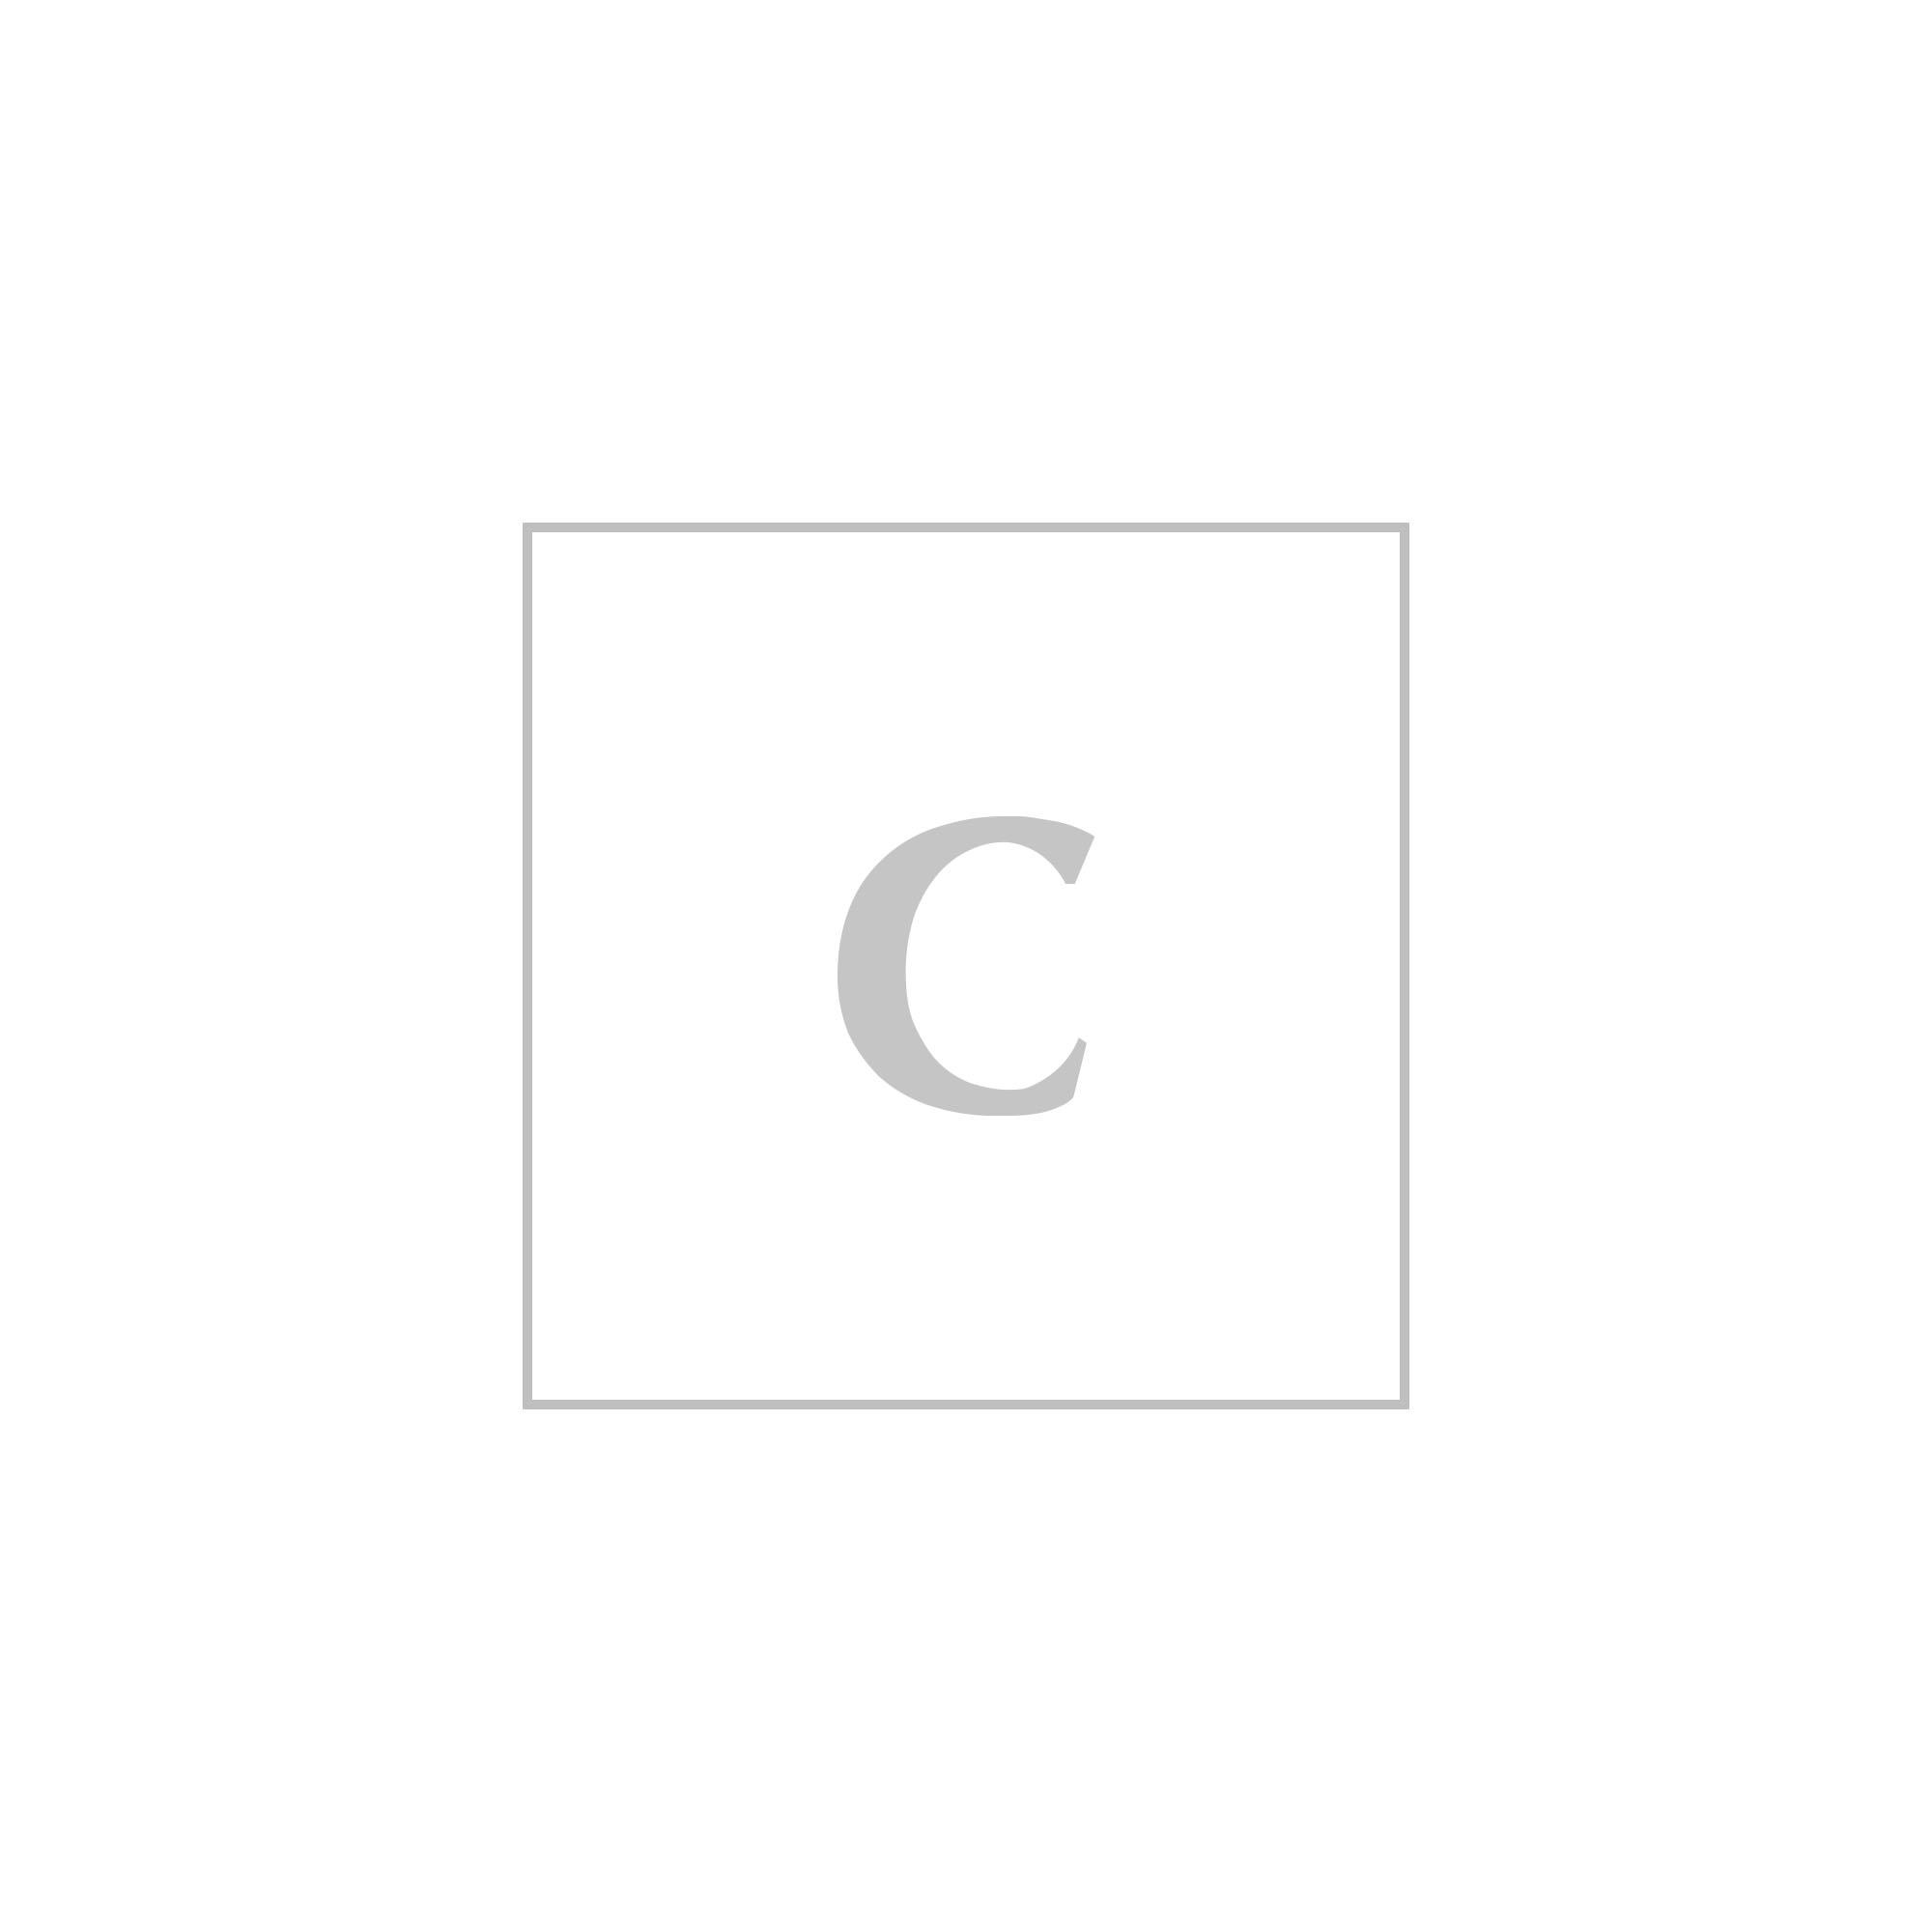 Dolce & gabbana zaino canvas stampato